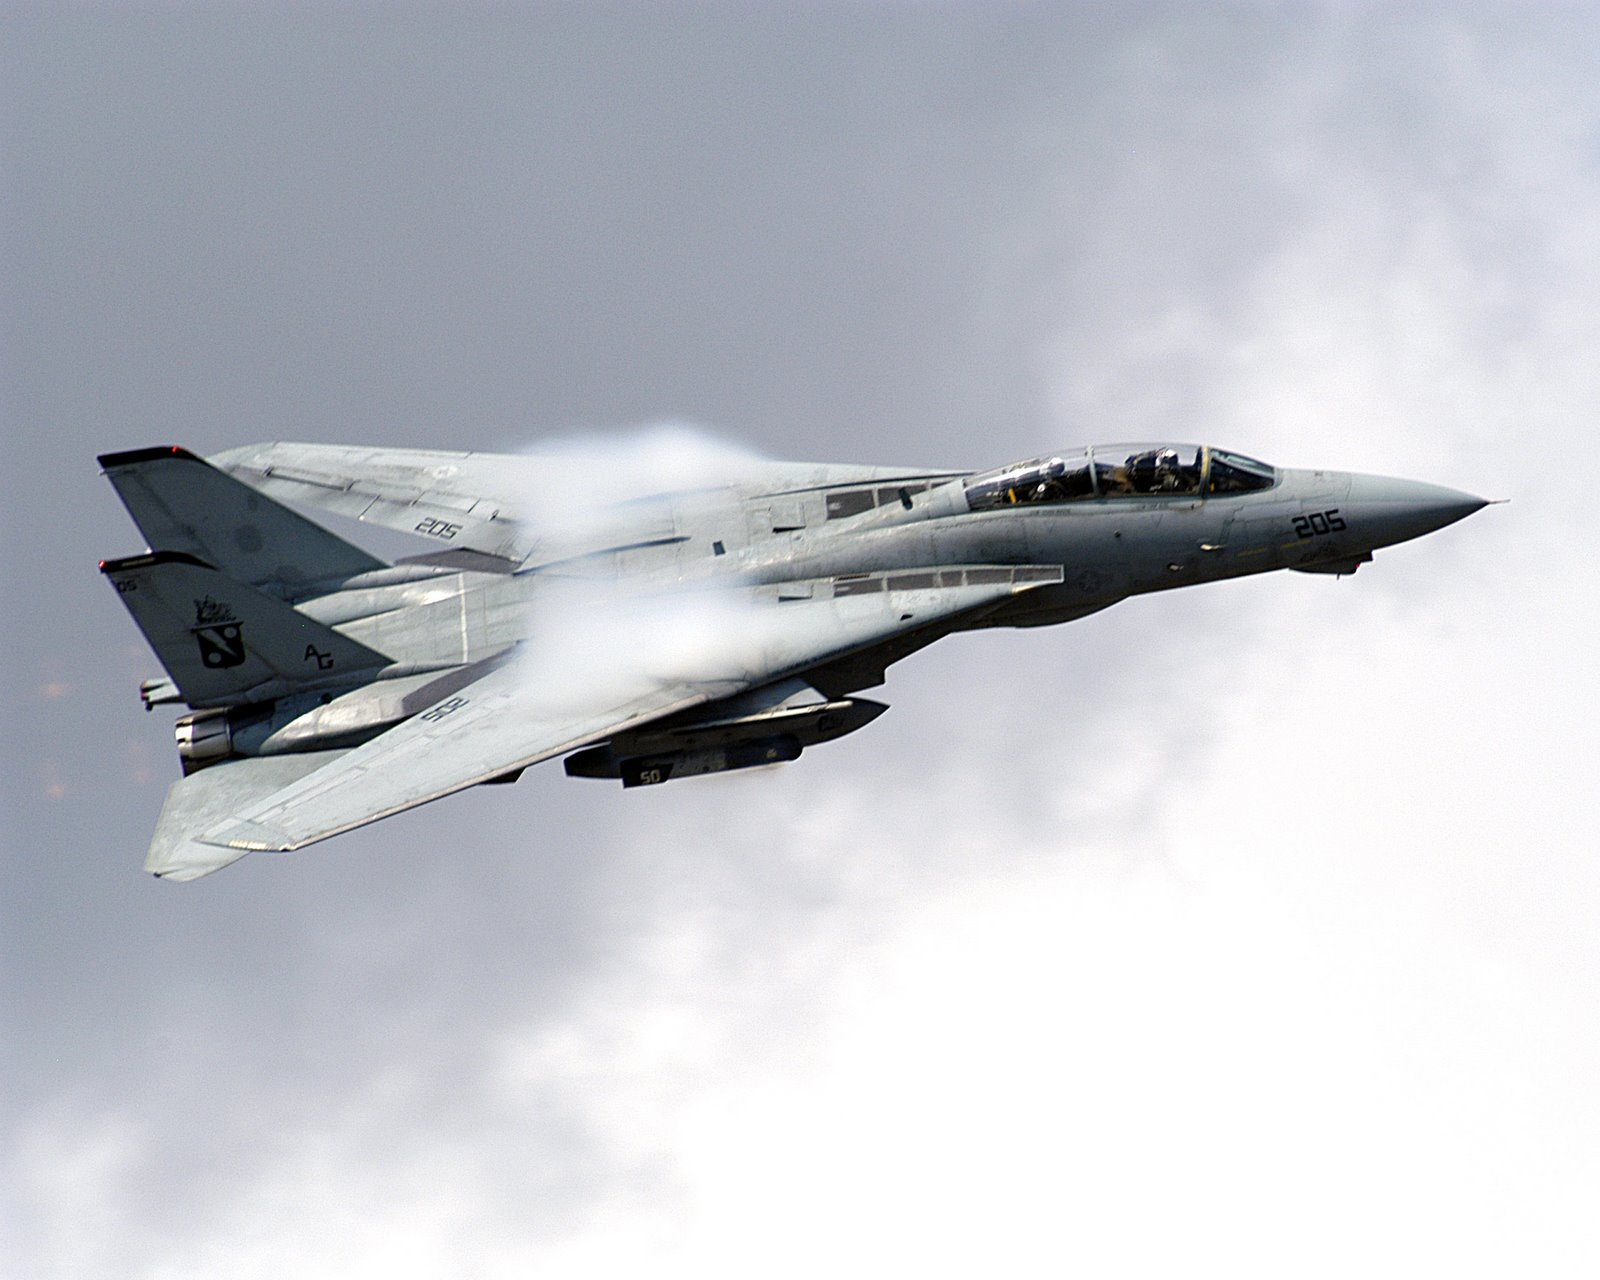 14 tomcat jet fighter - photo #8